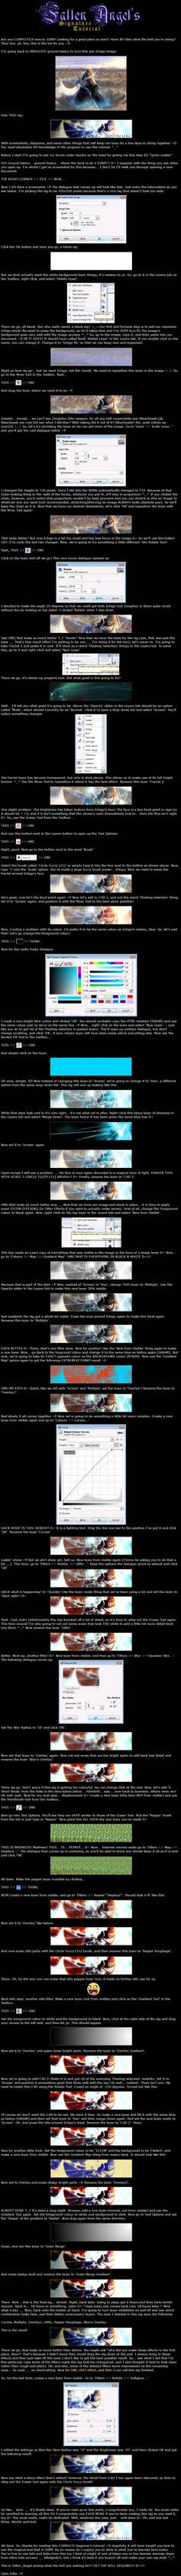 Complete GIMP Beginner's Tut